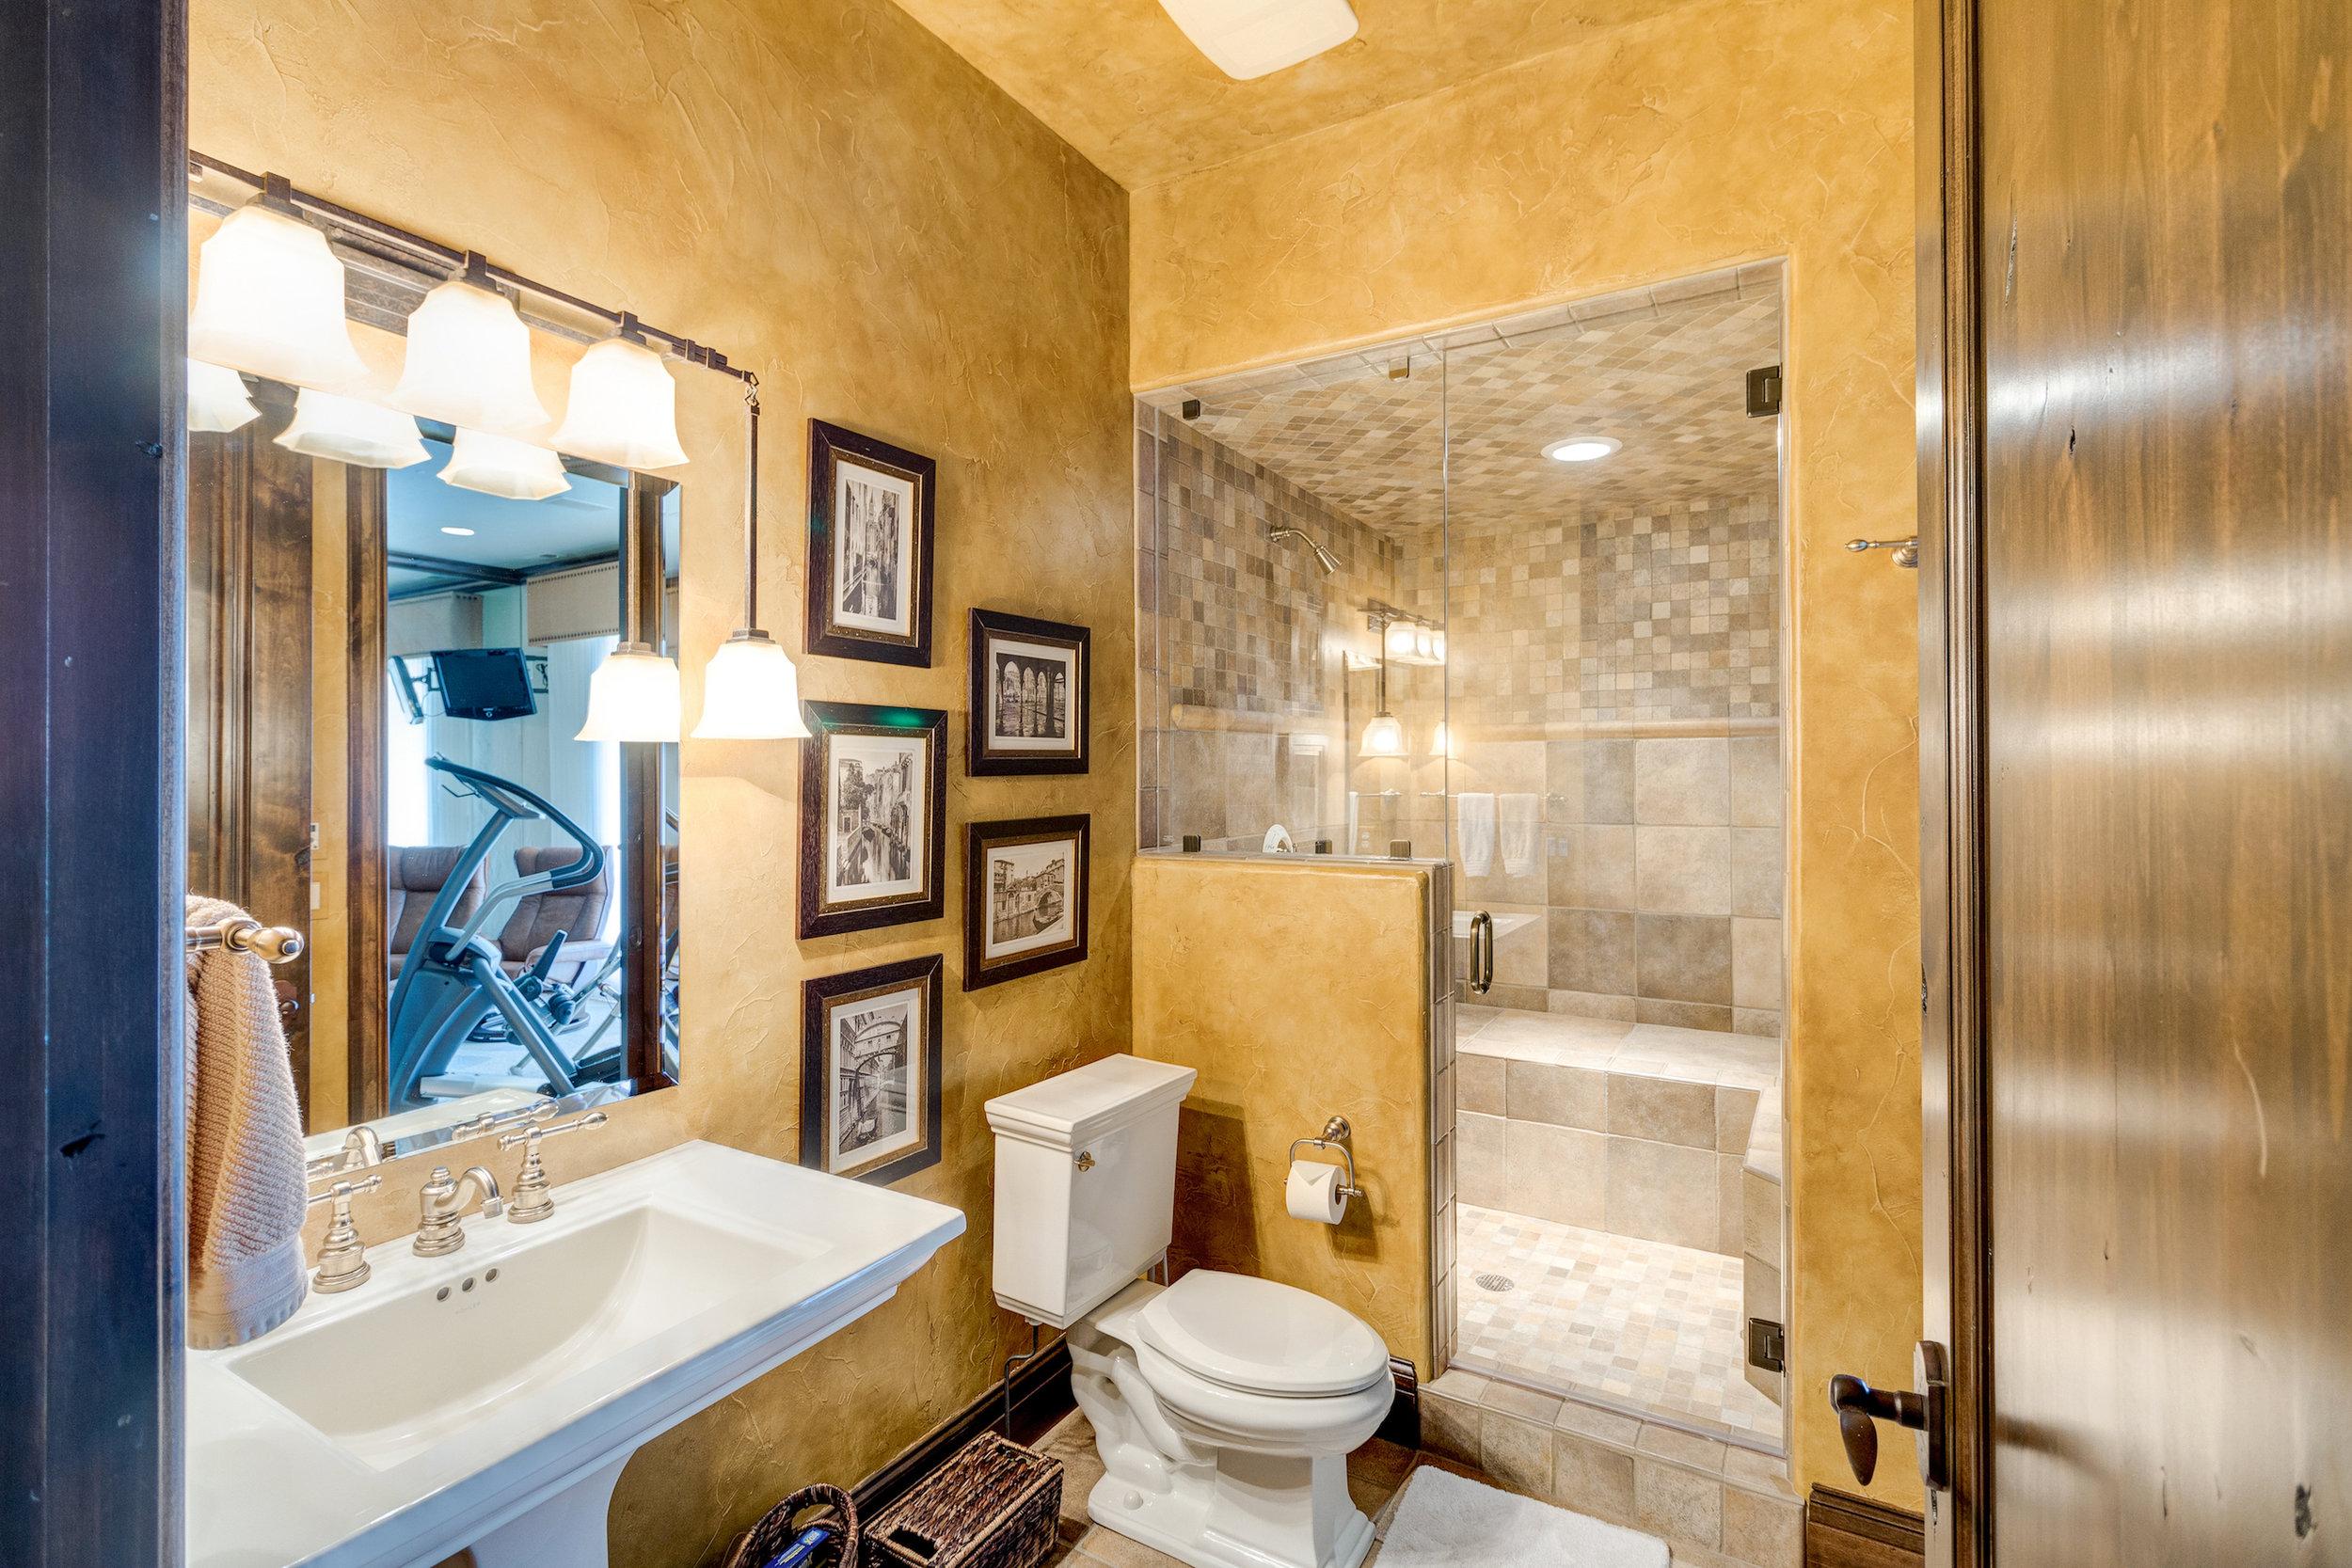 22-Basement Bathroom with steam shower.jpg